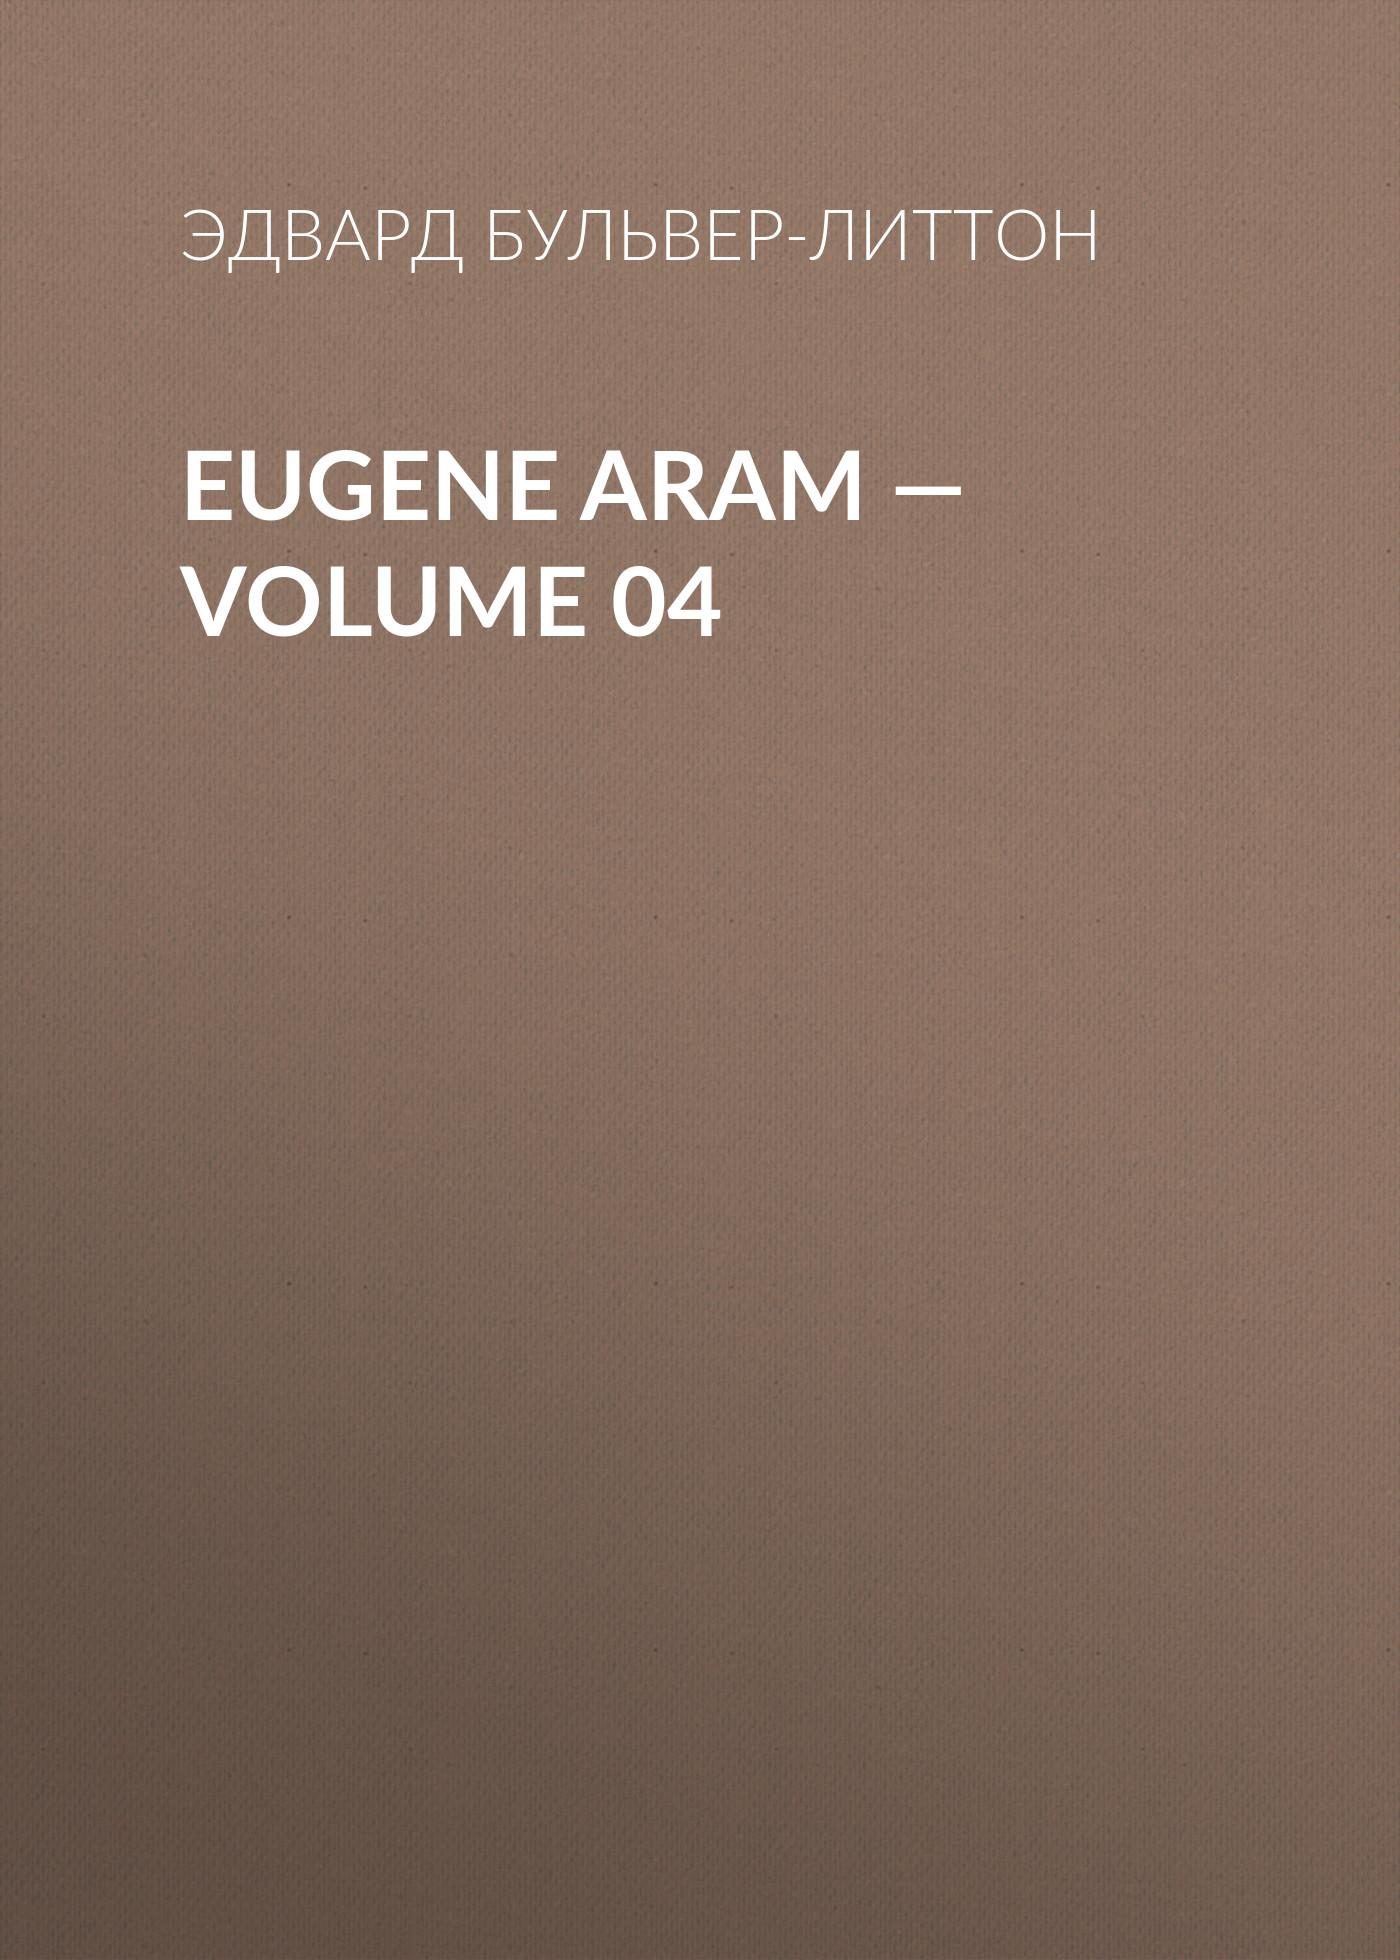 Эдвард Бульвер-Литтон Eugene Aram — Volume 04 эдвард бульвер литтон ernest maltravers volume 04